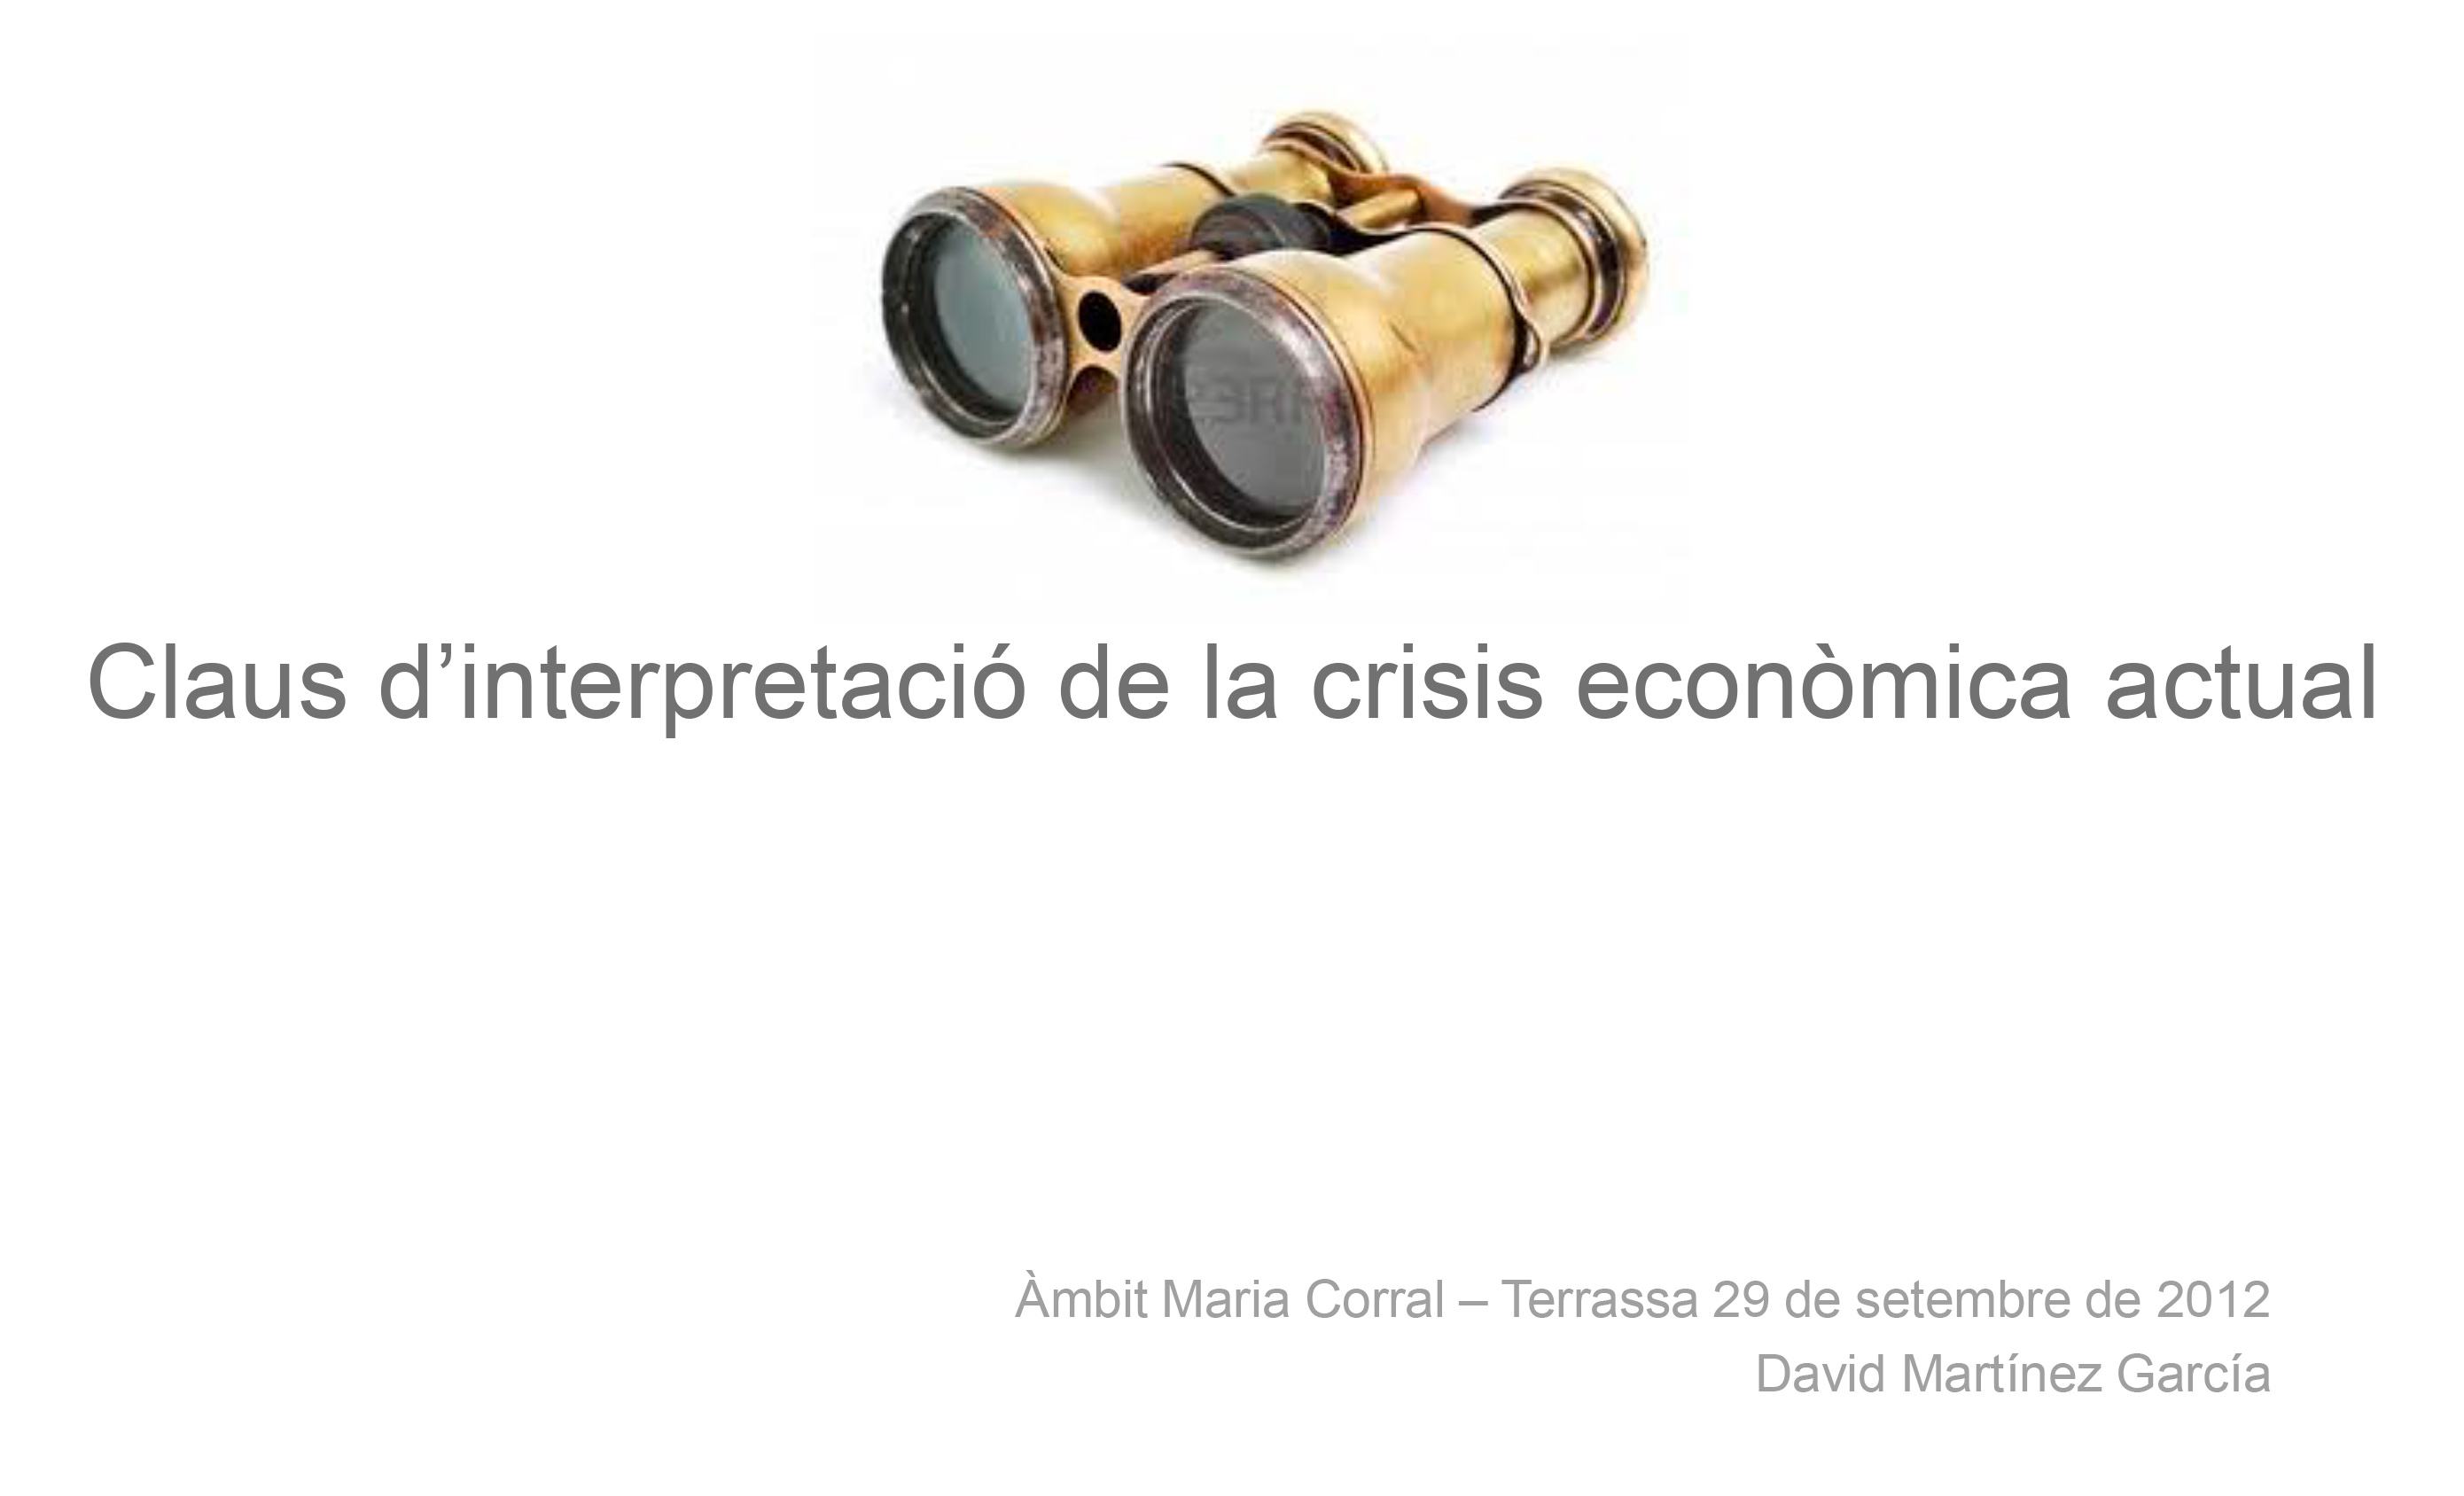 targeta-claus-interpretacio-crisi-set-2012-1